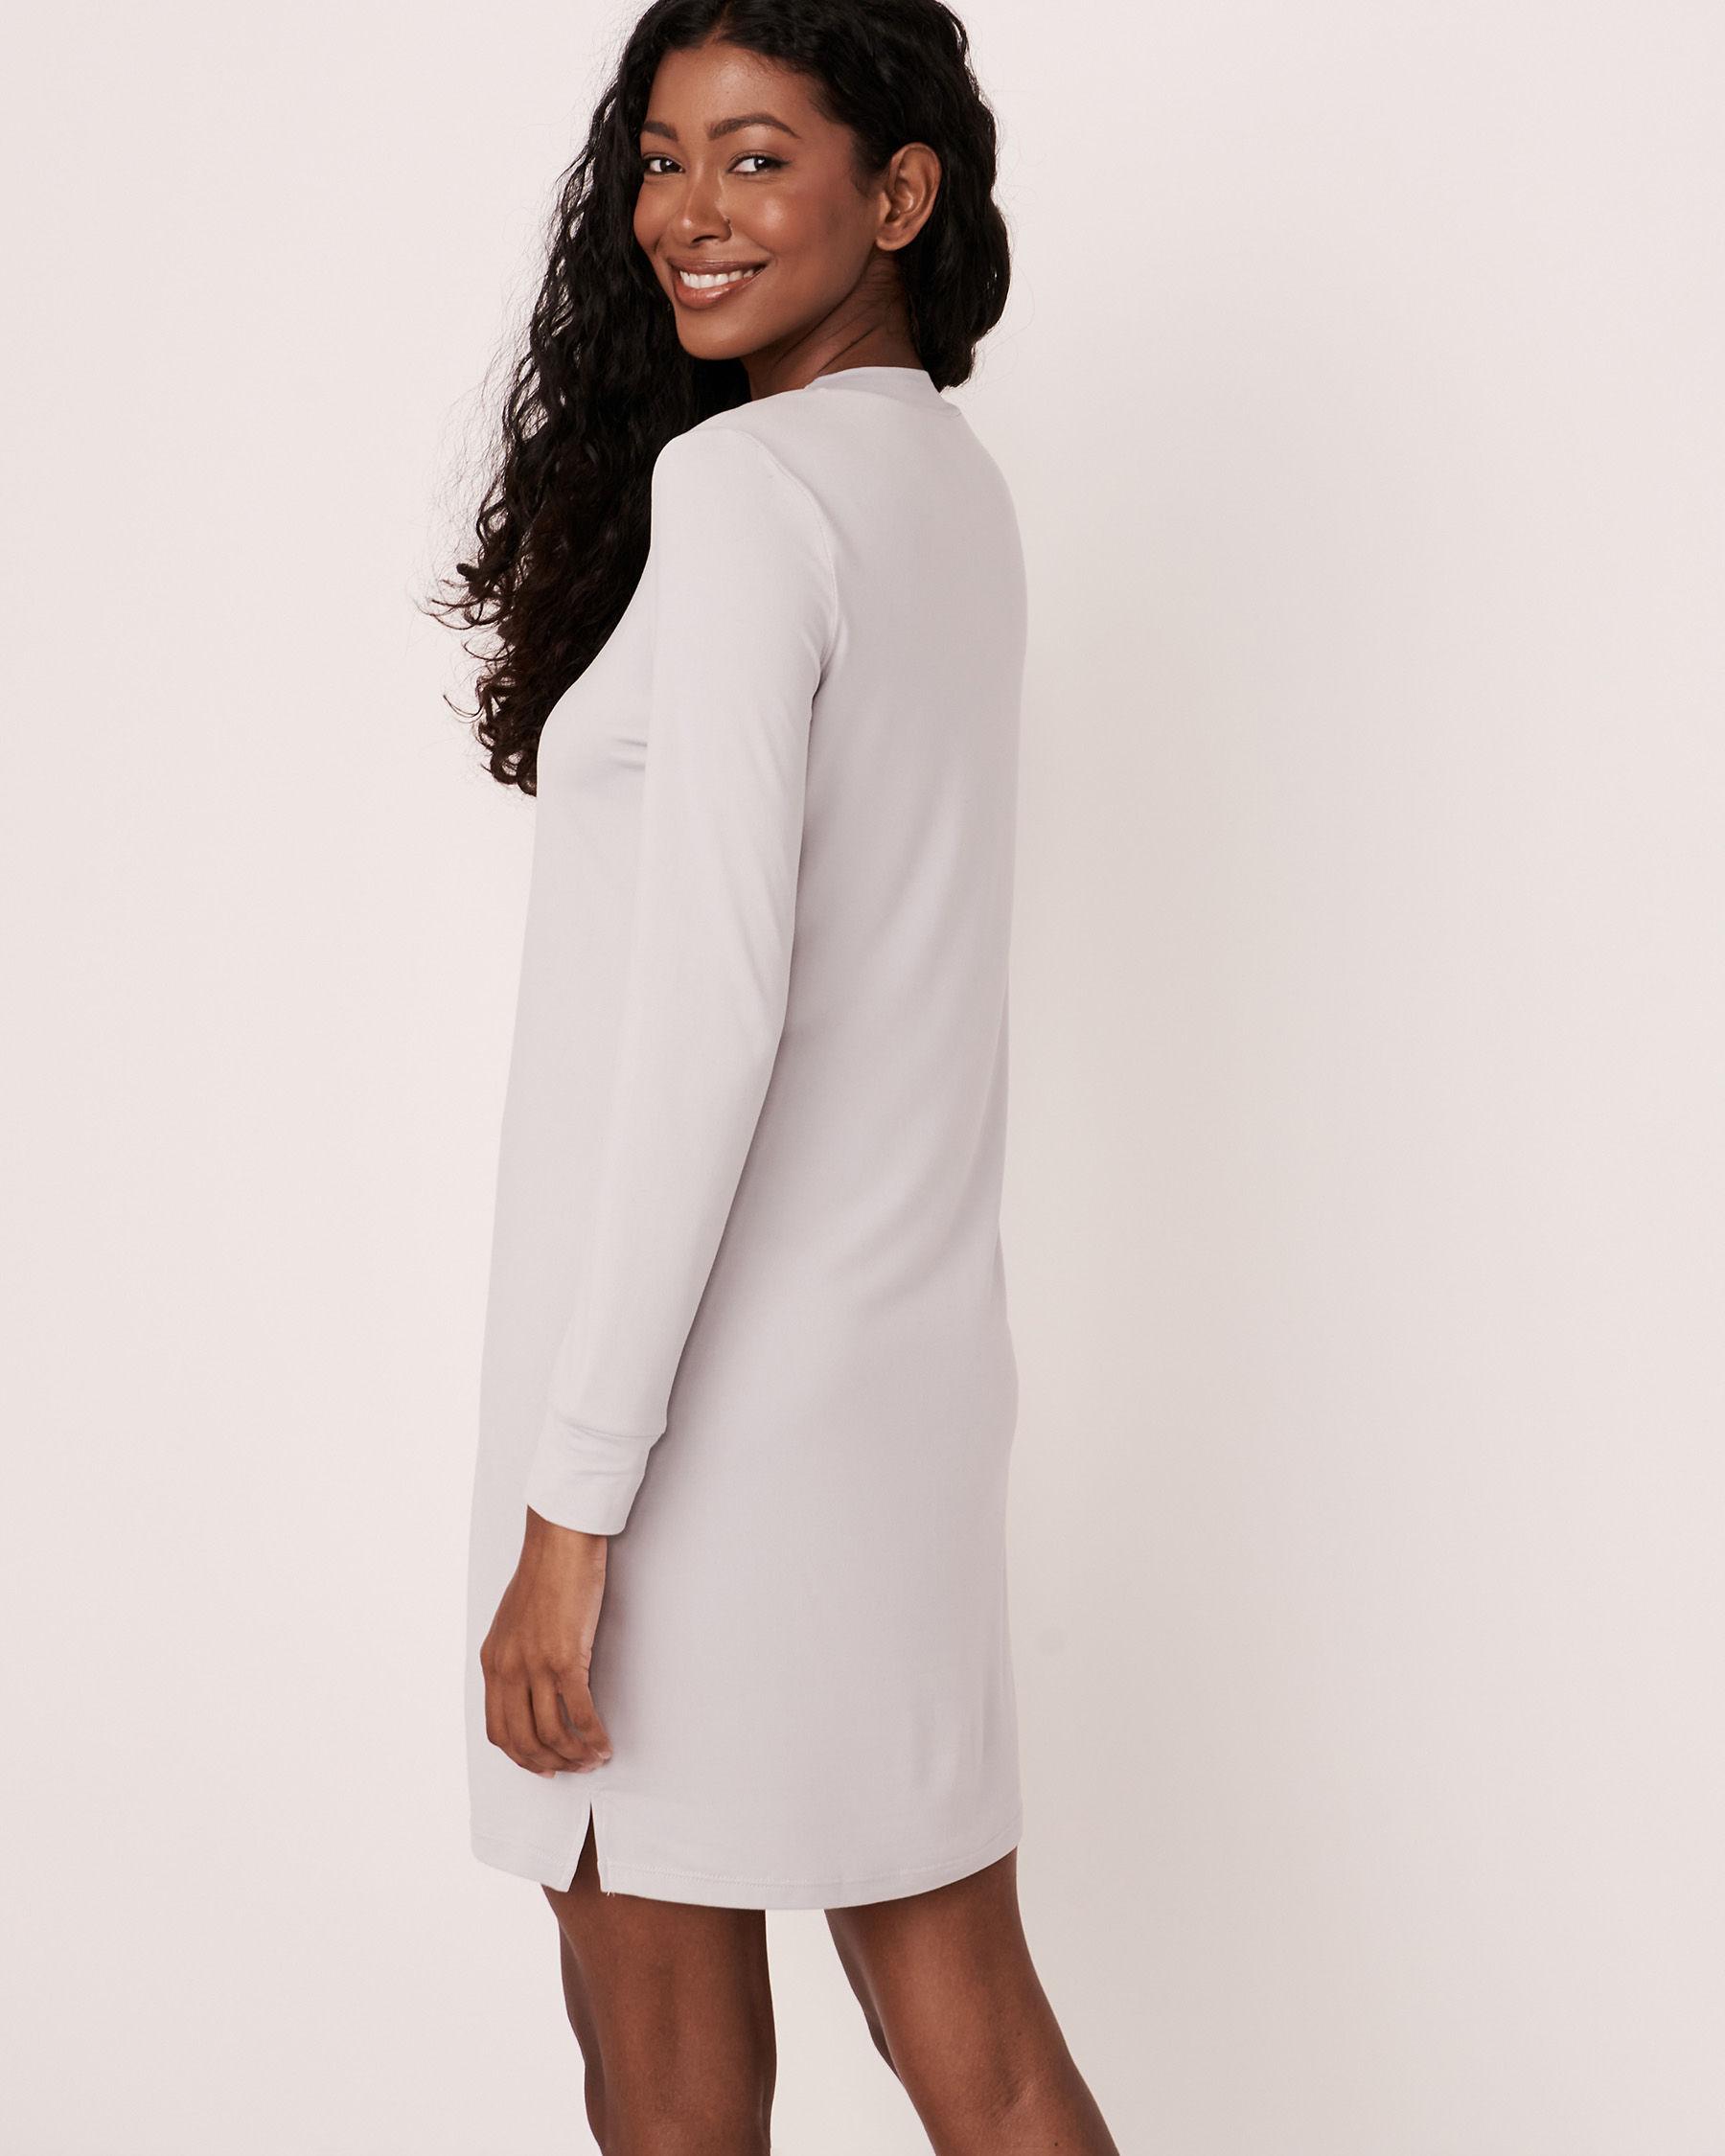 LA VIE EN ROSE High Neck Long Sleeve Sleepshirt Grey print 40500076 - View3